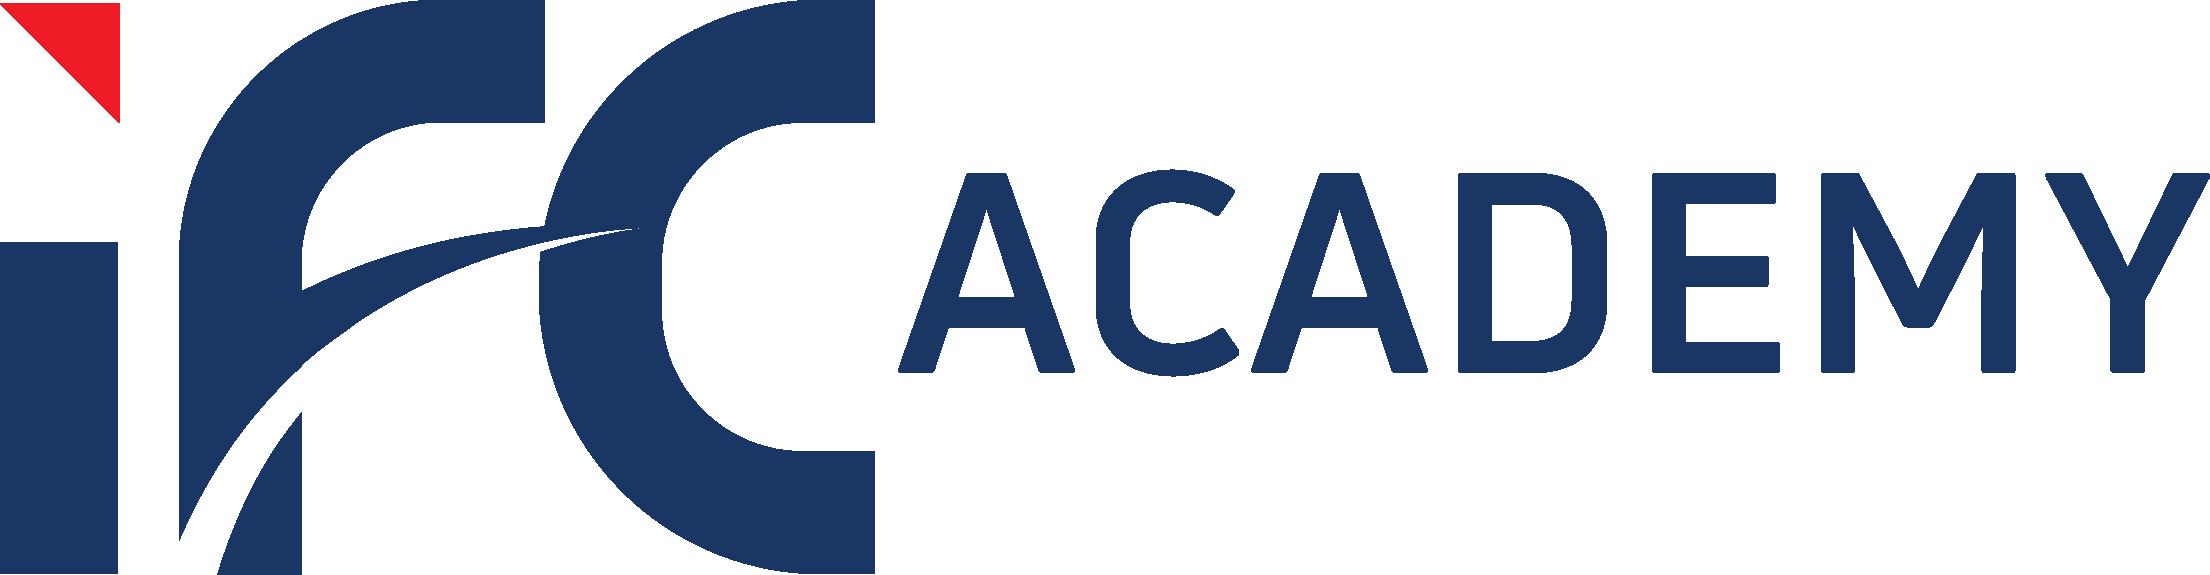 IFC Academy, Business Education